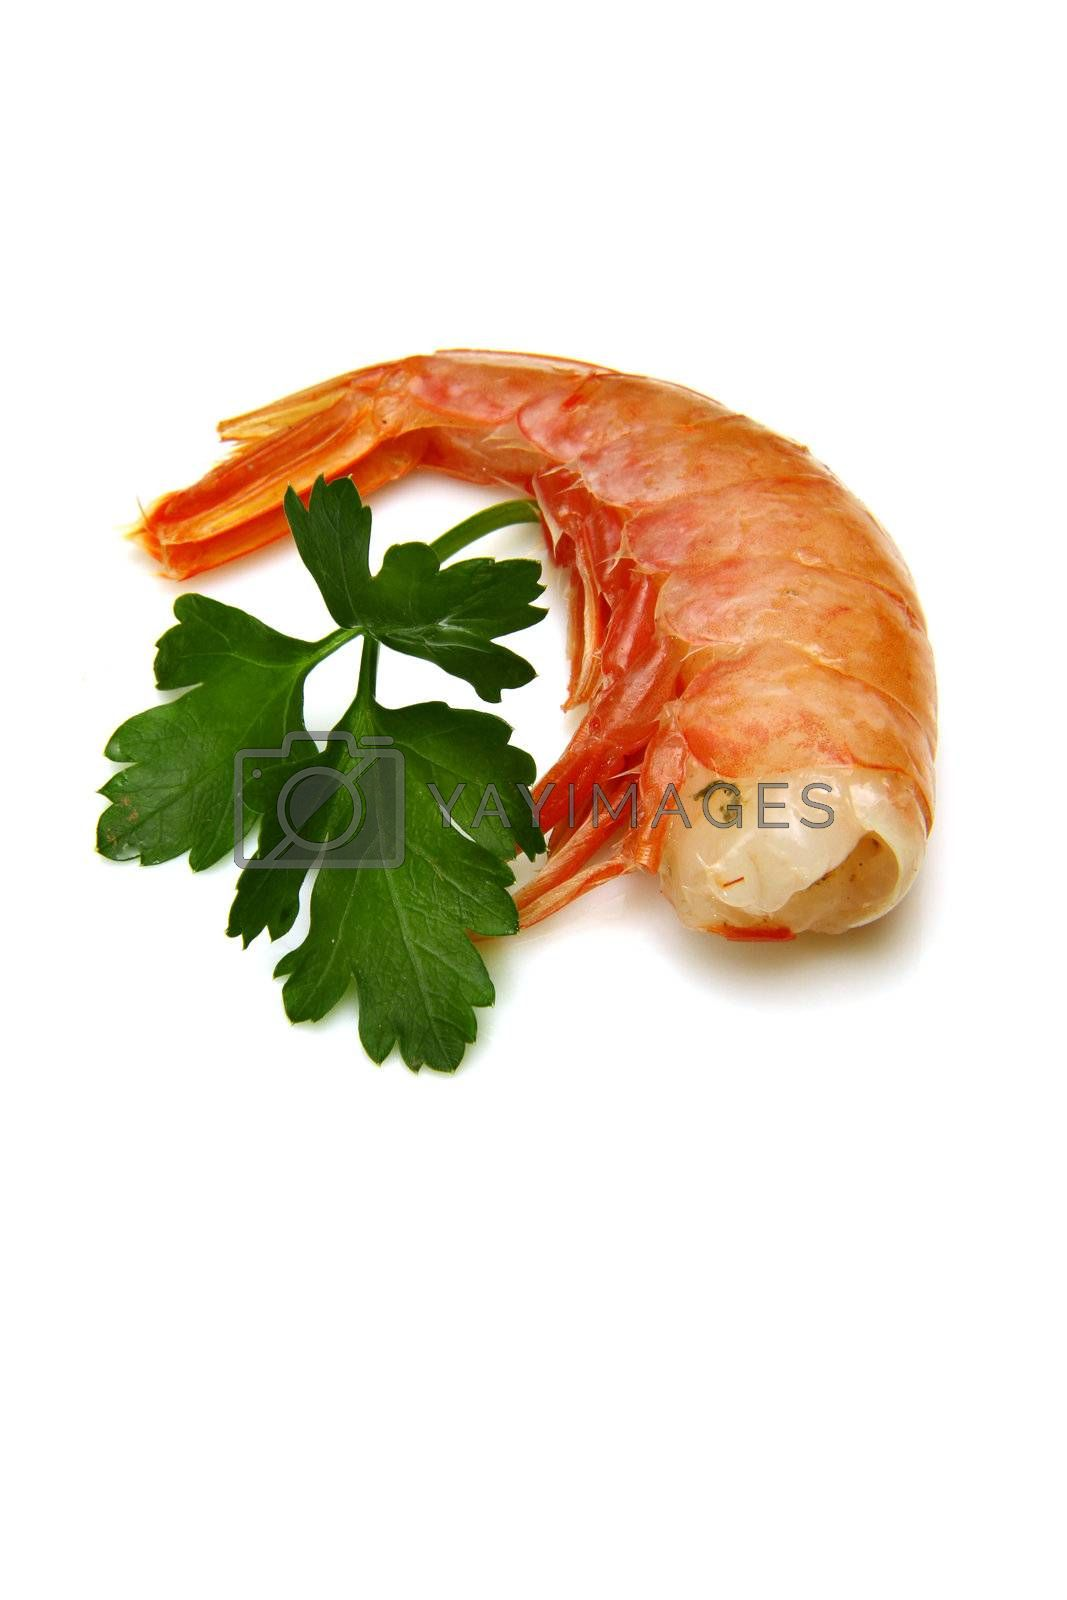 Royalty free image of shrimp by lsantilli